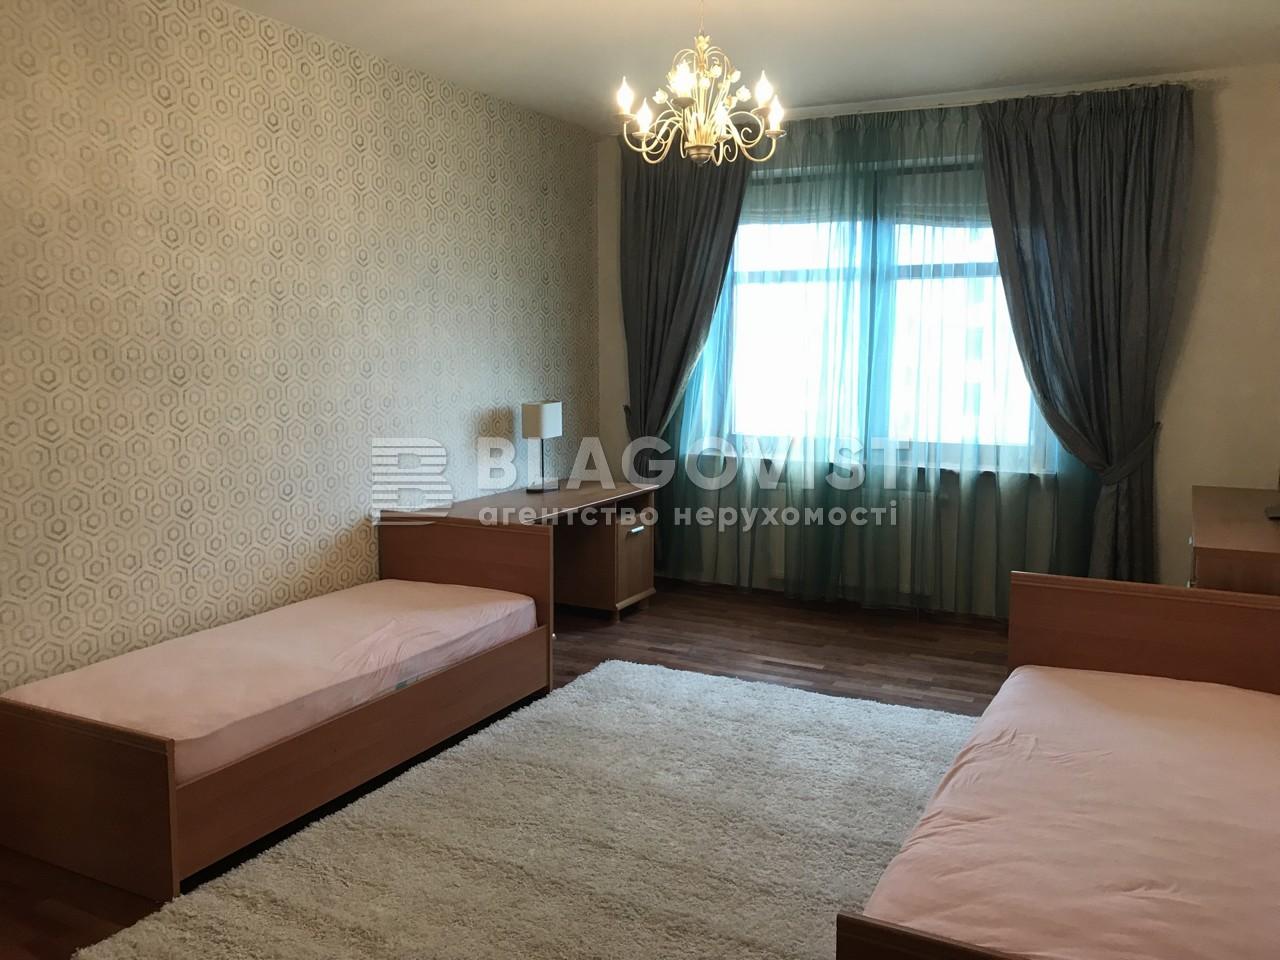 Квартира A-73479, Коновальца Евгения (Щорса), 32а, Киев - Фото 25